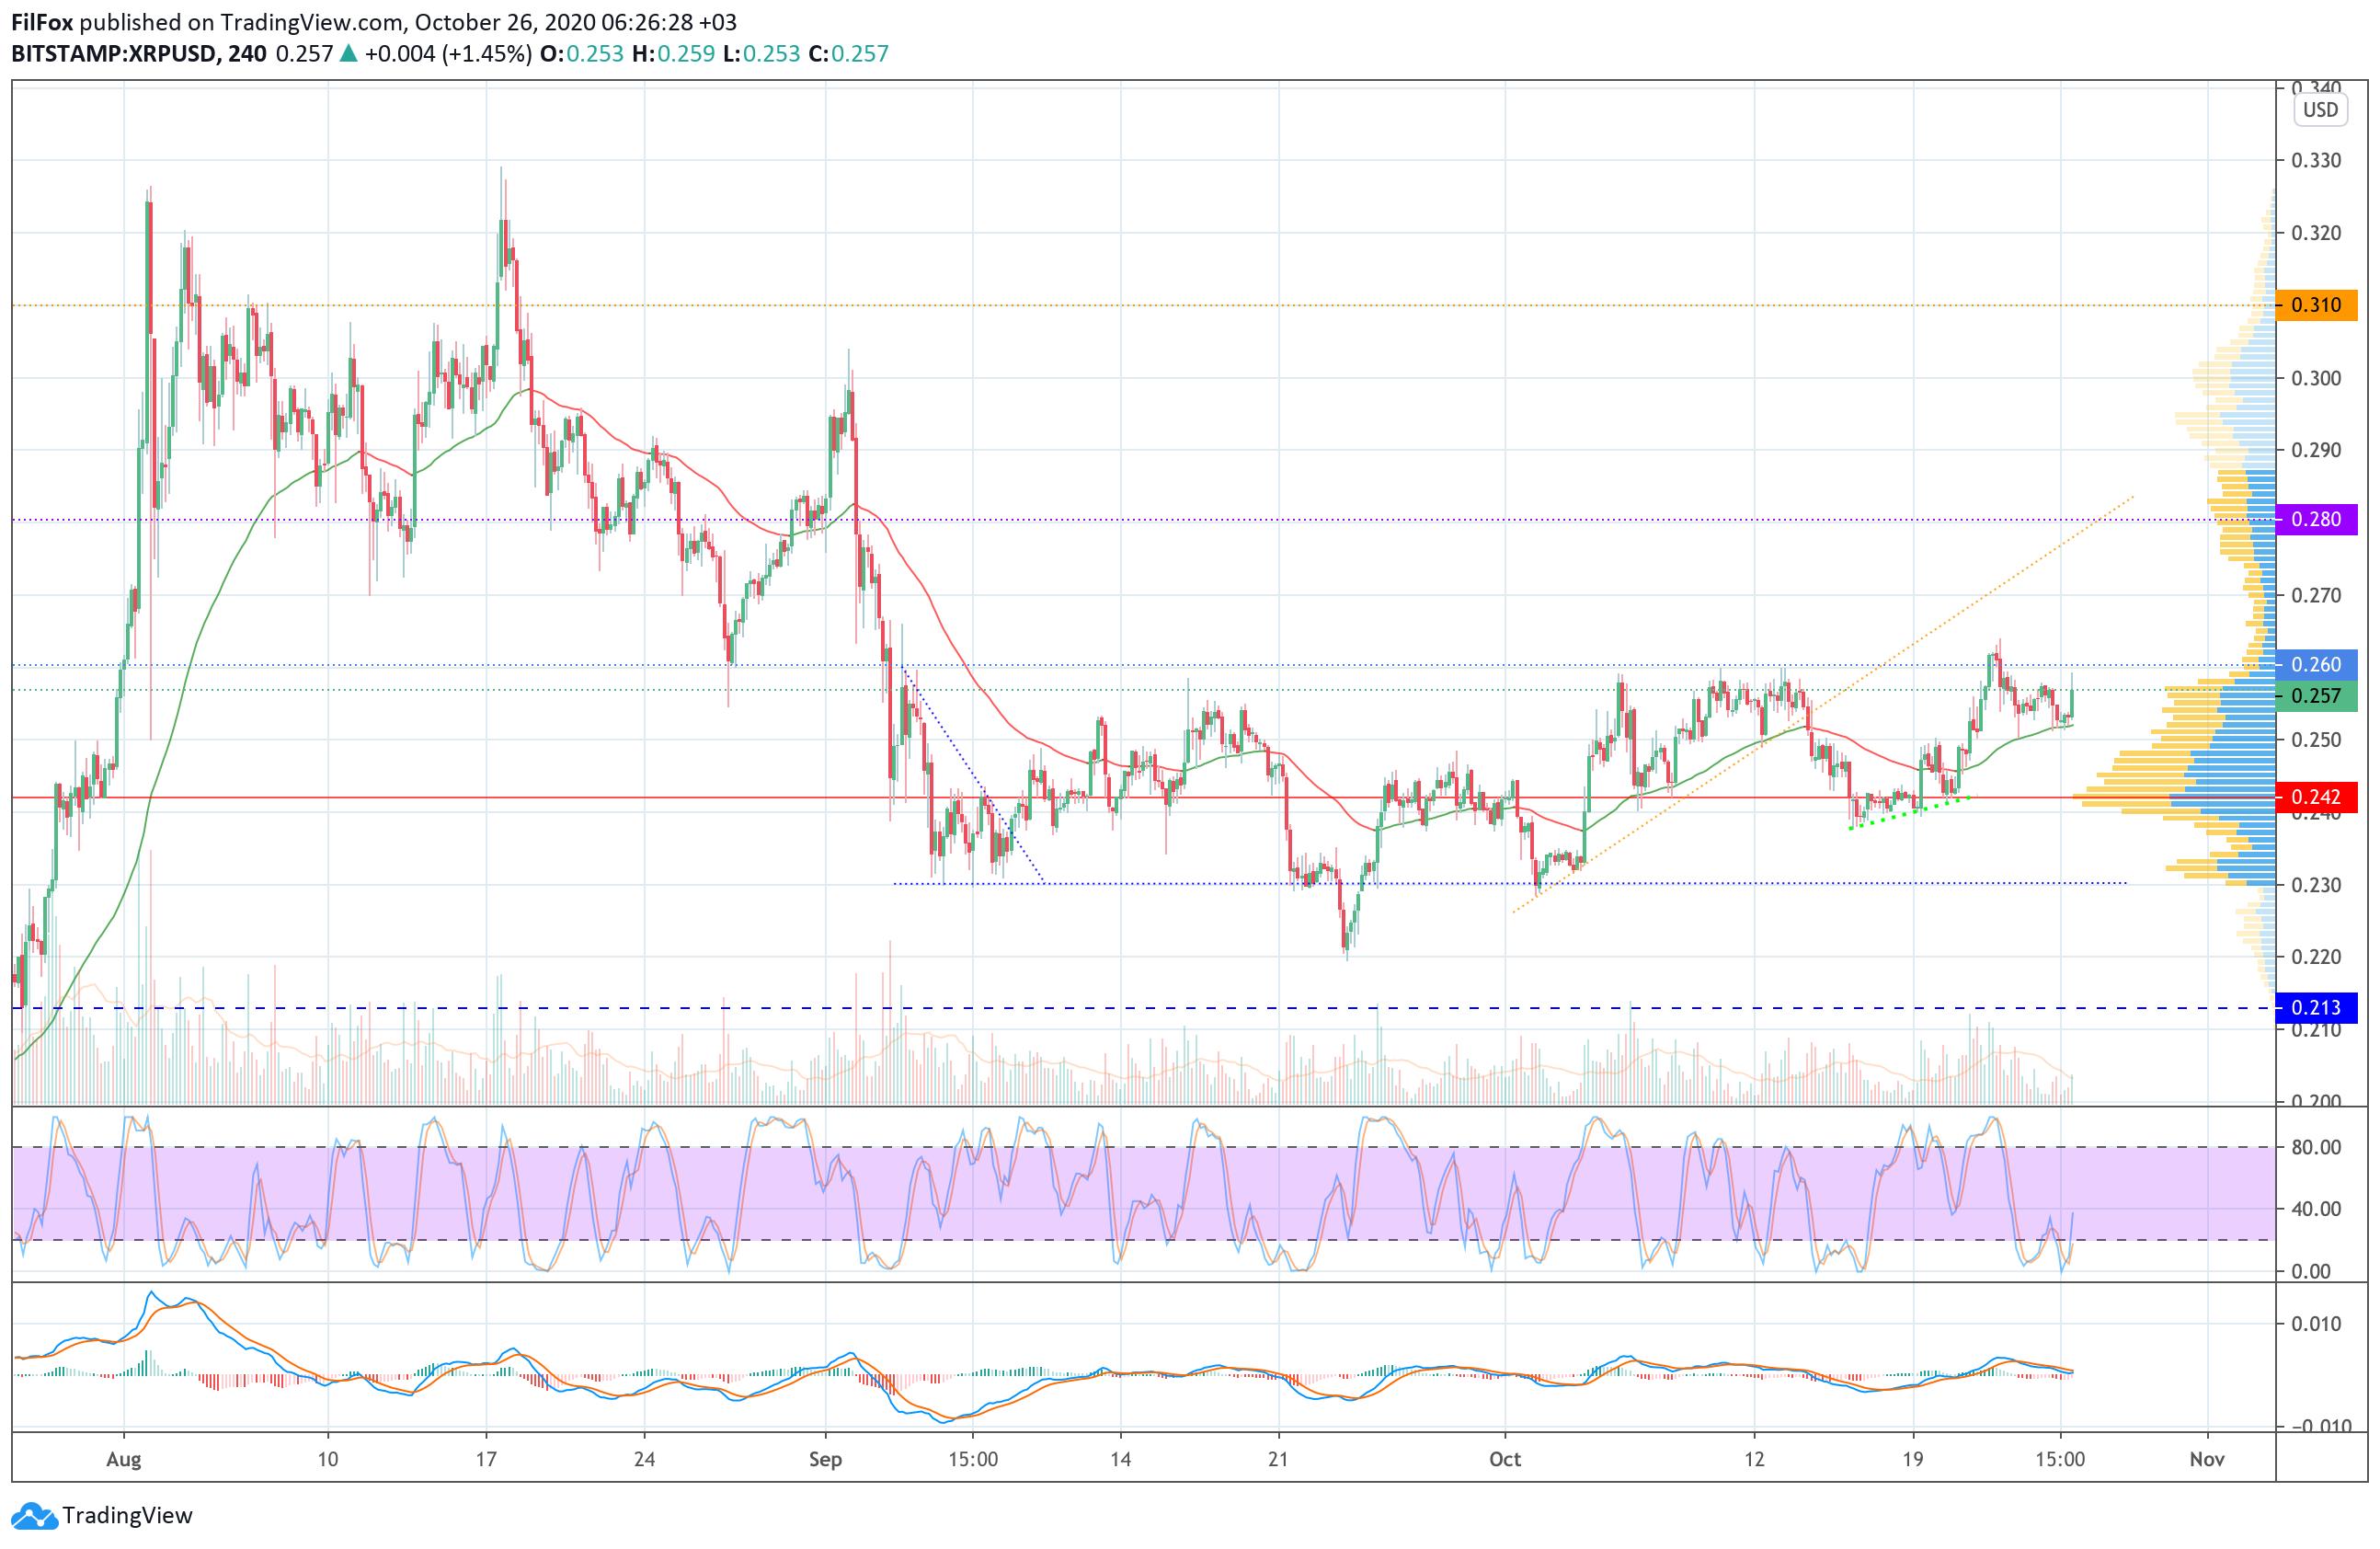 Анализ цен BTC, ETH, XRP (26.10.20)